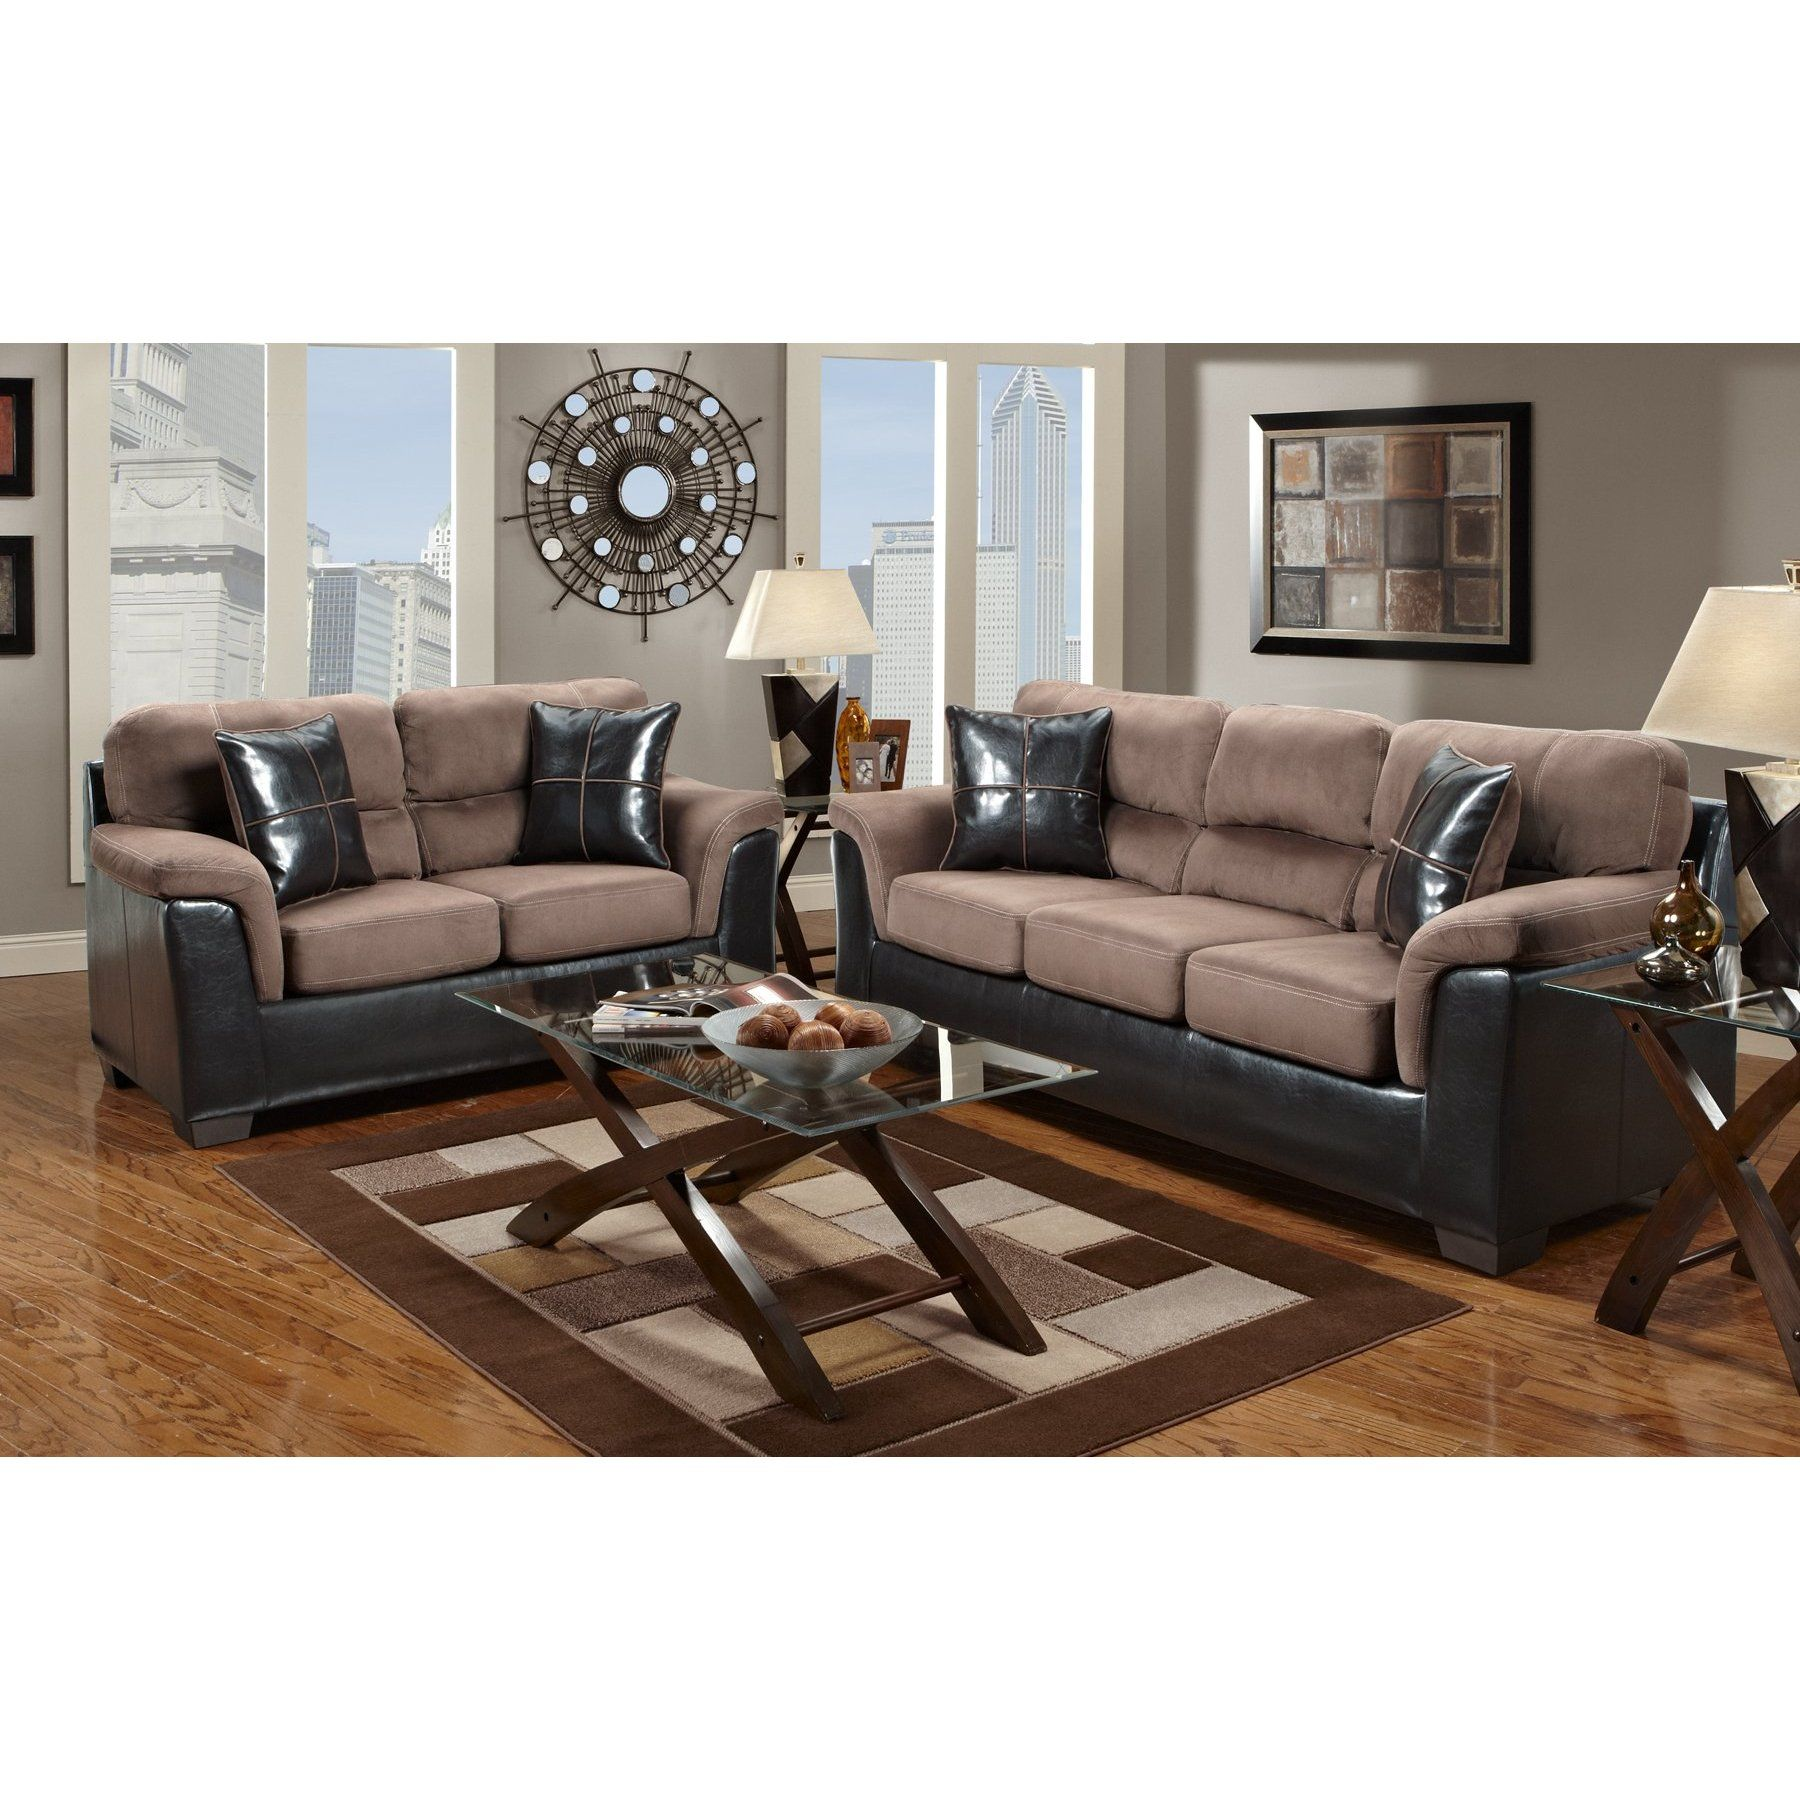 Furniturema Laredo Chocolate Brown Two Tone Sofa Made In Usa Sofas